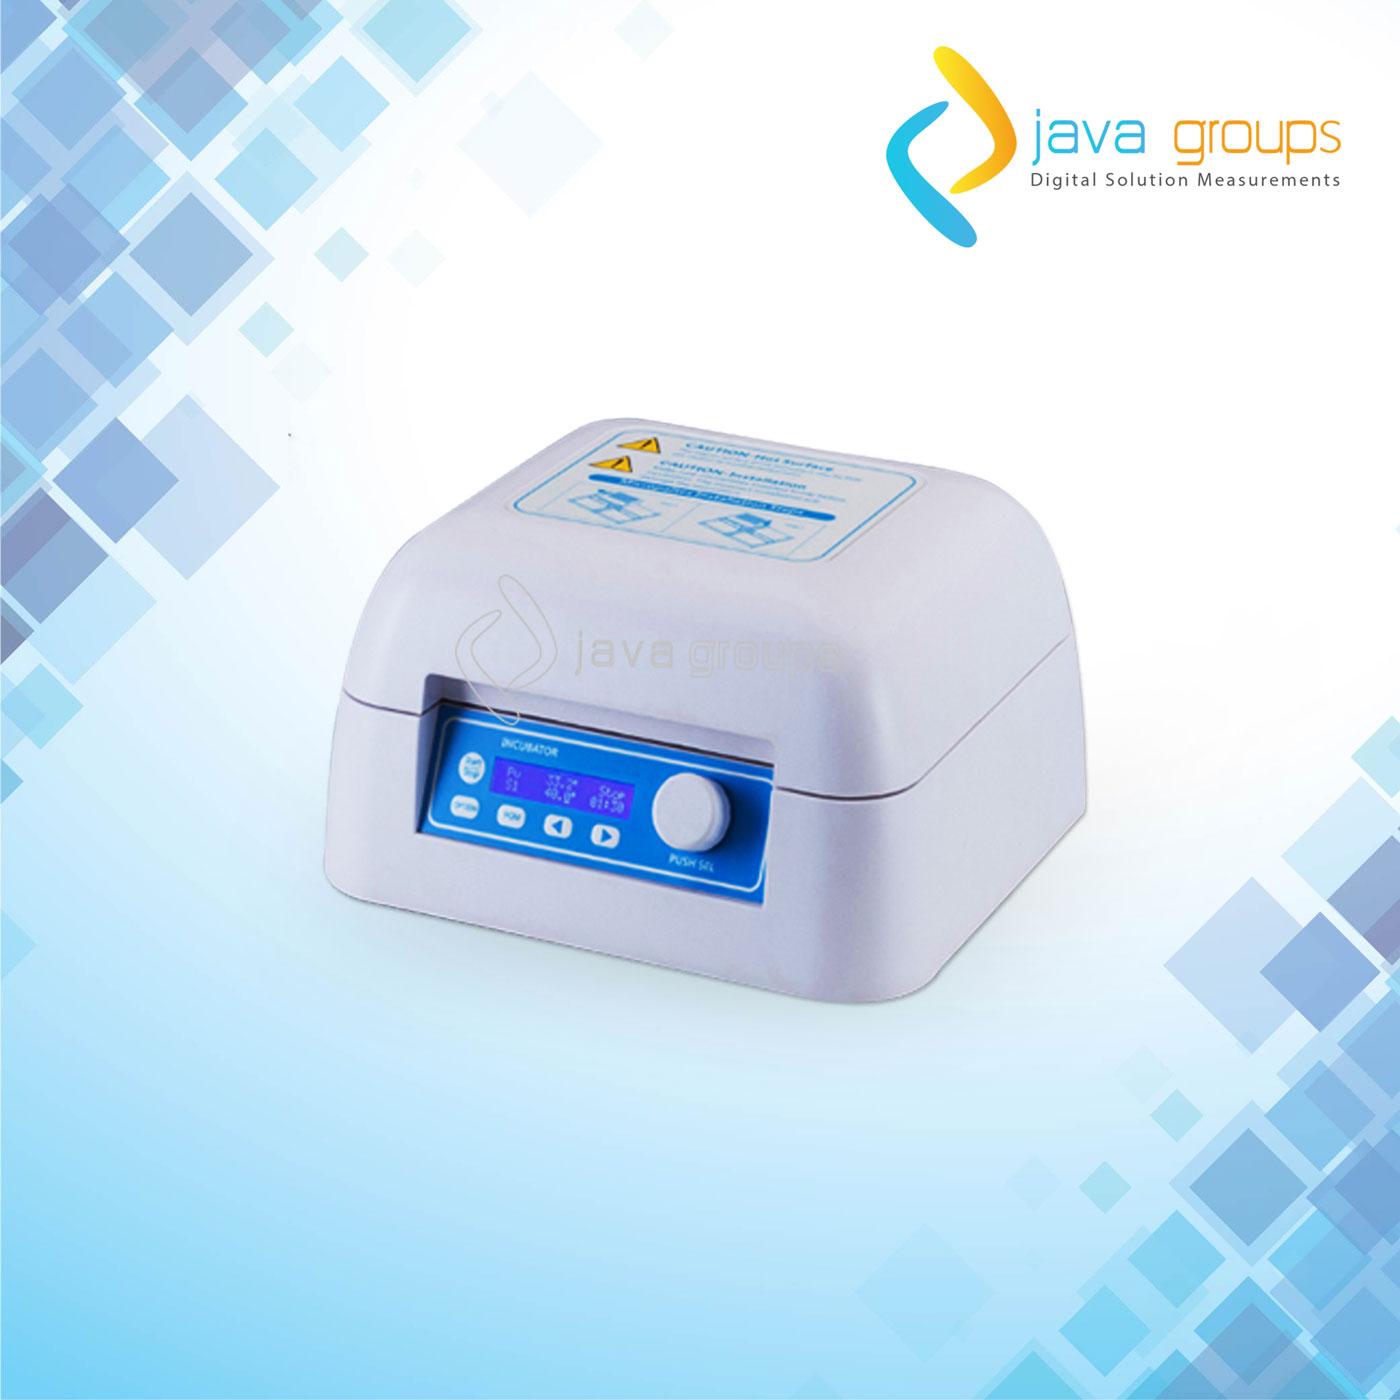 Alat Incubator Microplates Laboratorium